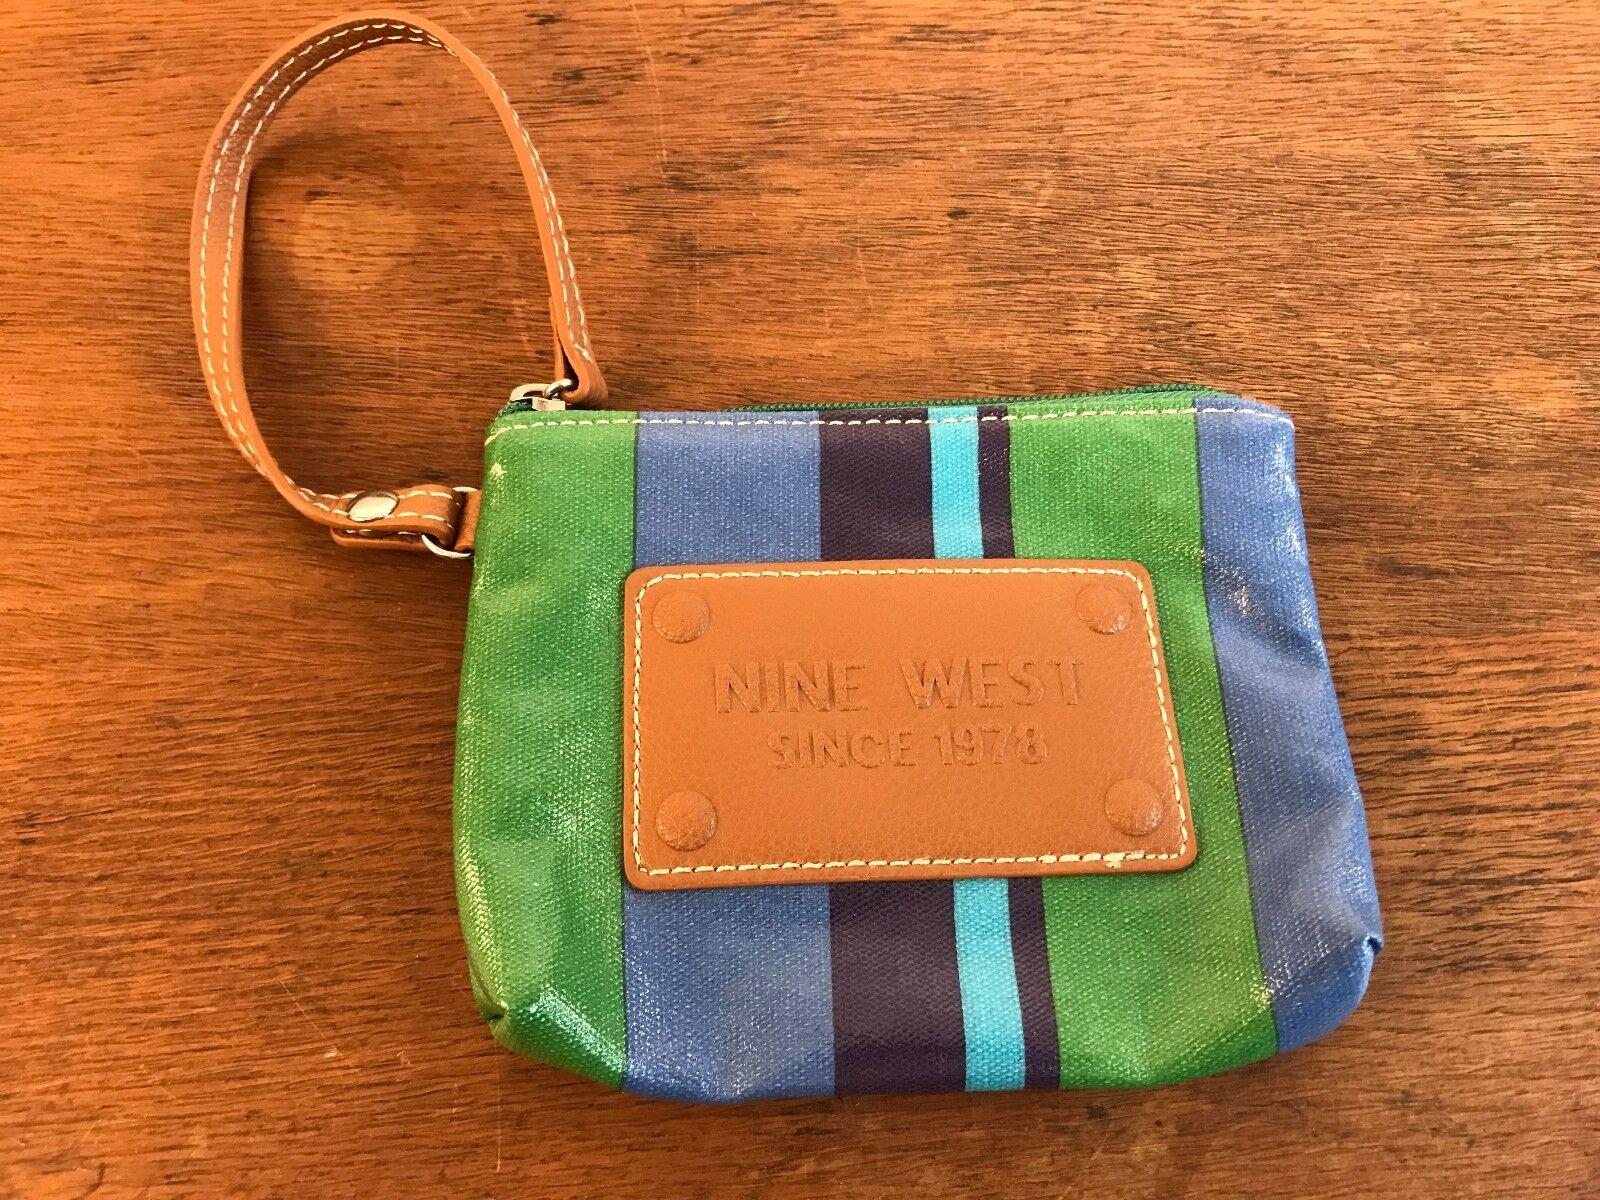 NINE WEST Colorful Wristlet Small Change Purse Wallet 6